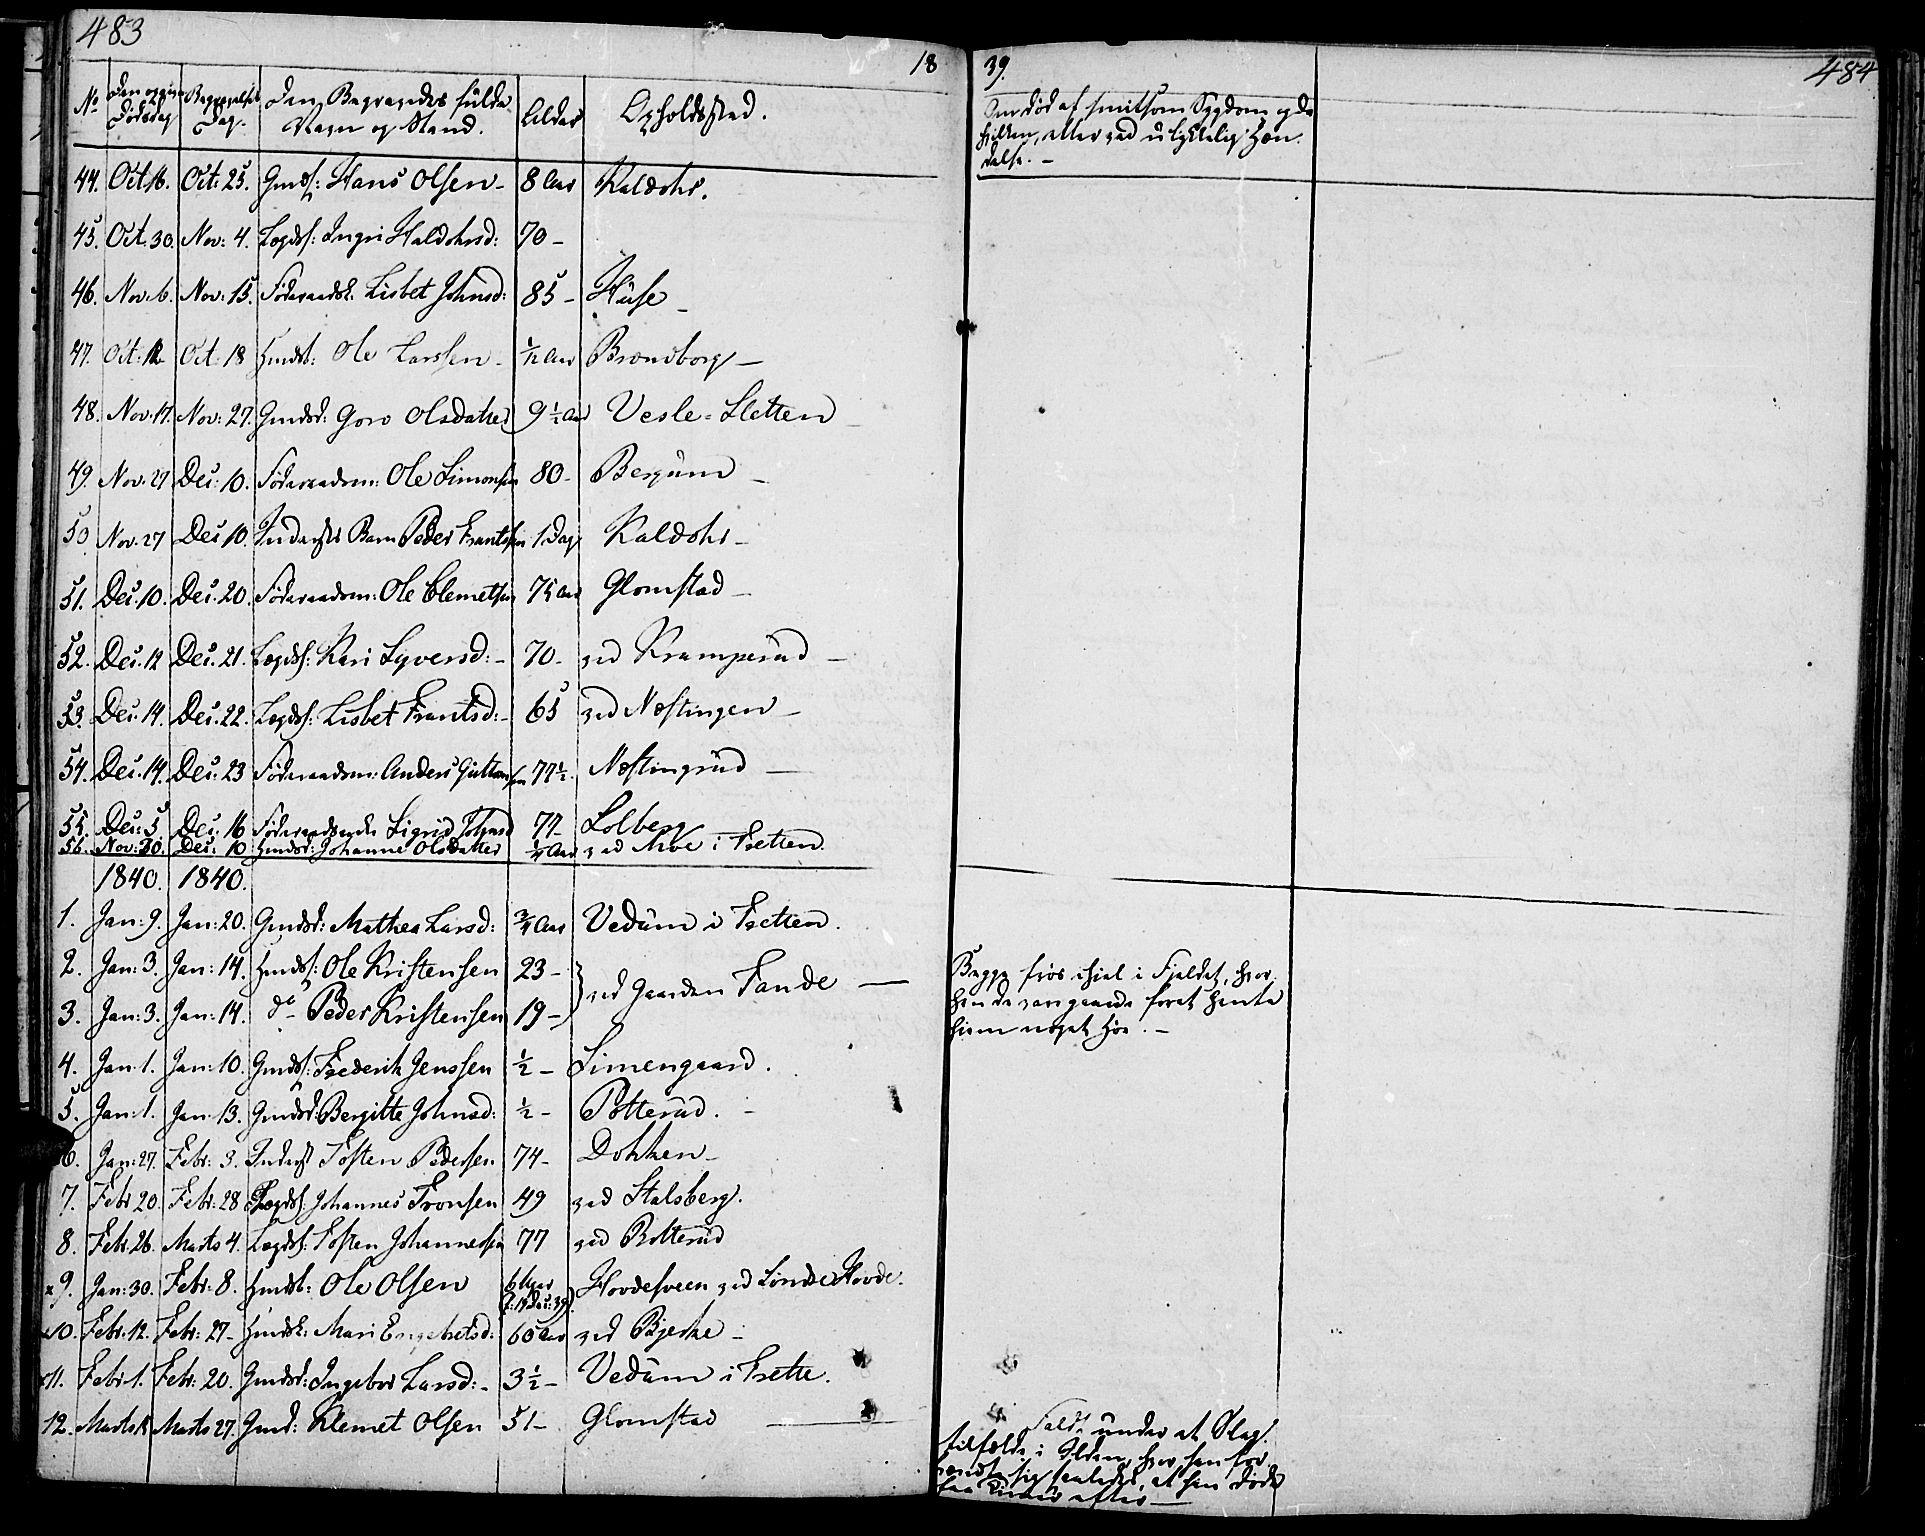 SAH, Øyer prestekontor, Ministerialbok nr. 4, 1824-1841, s. 483-484